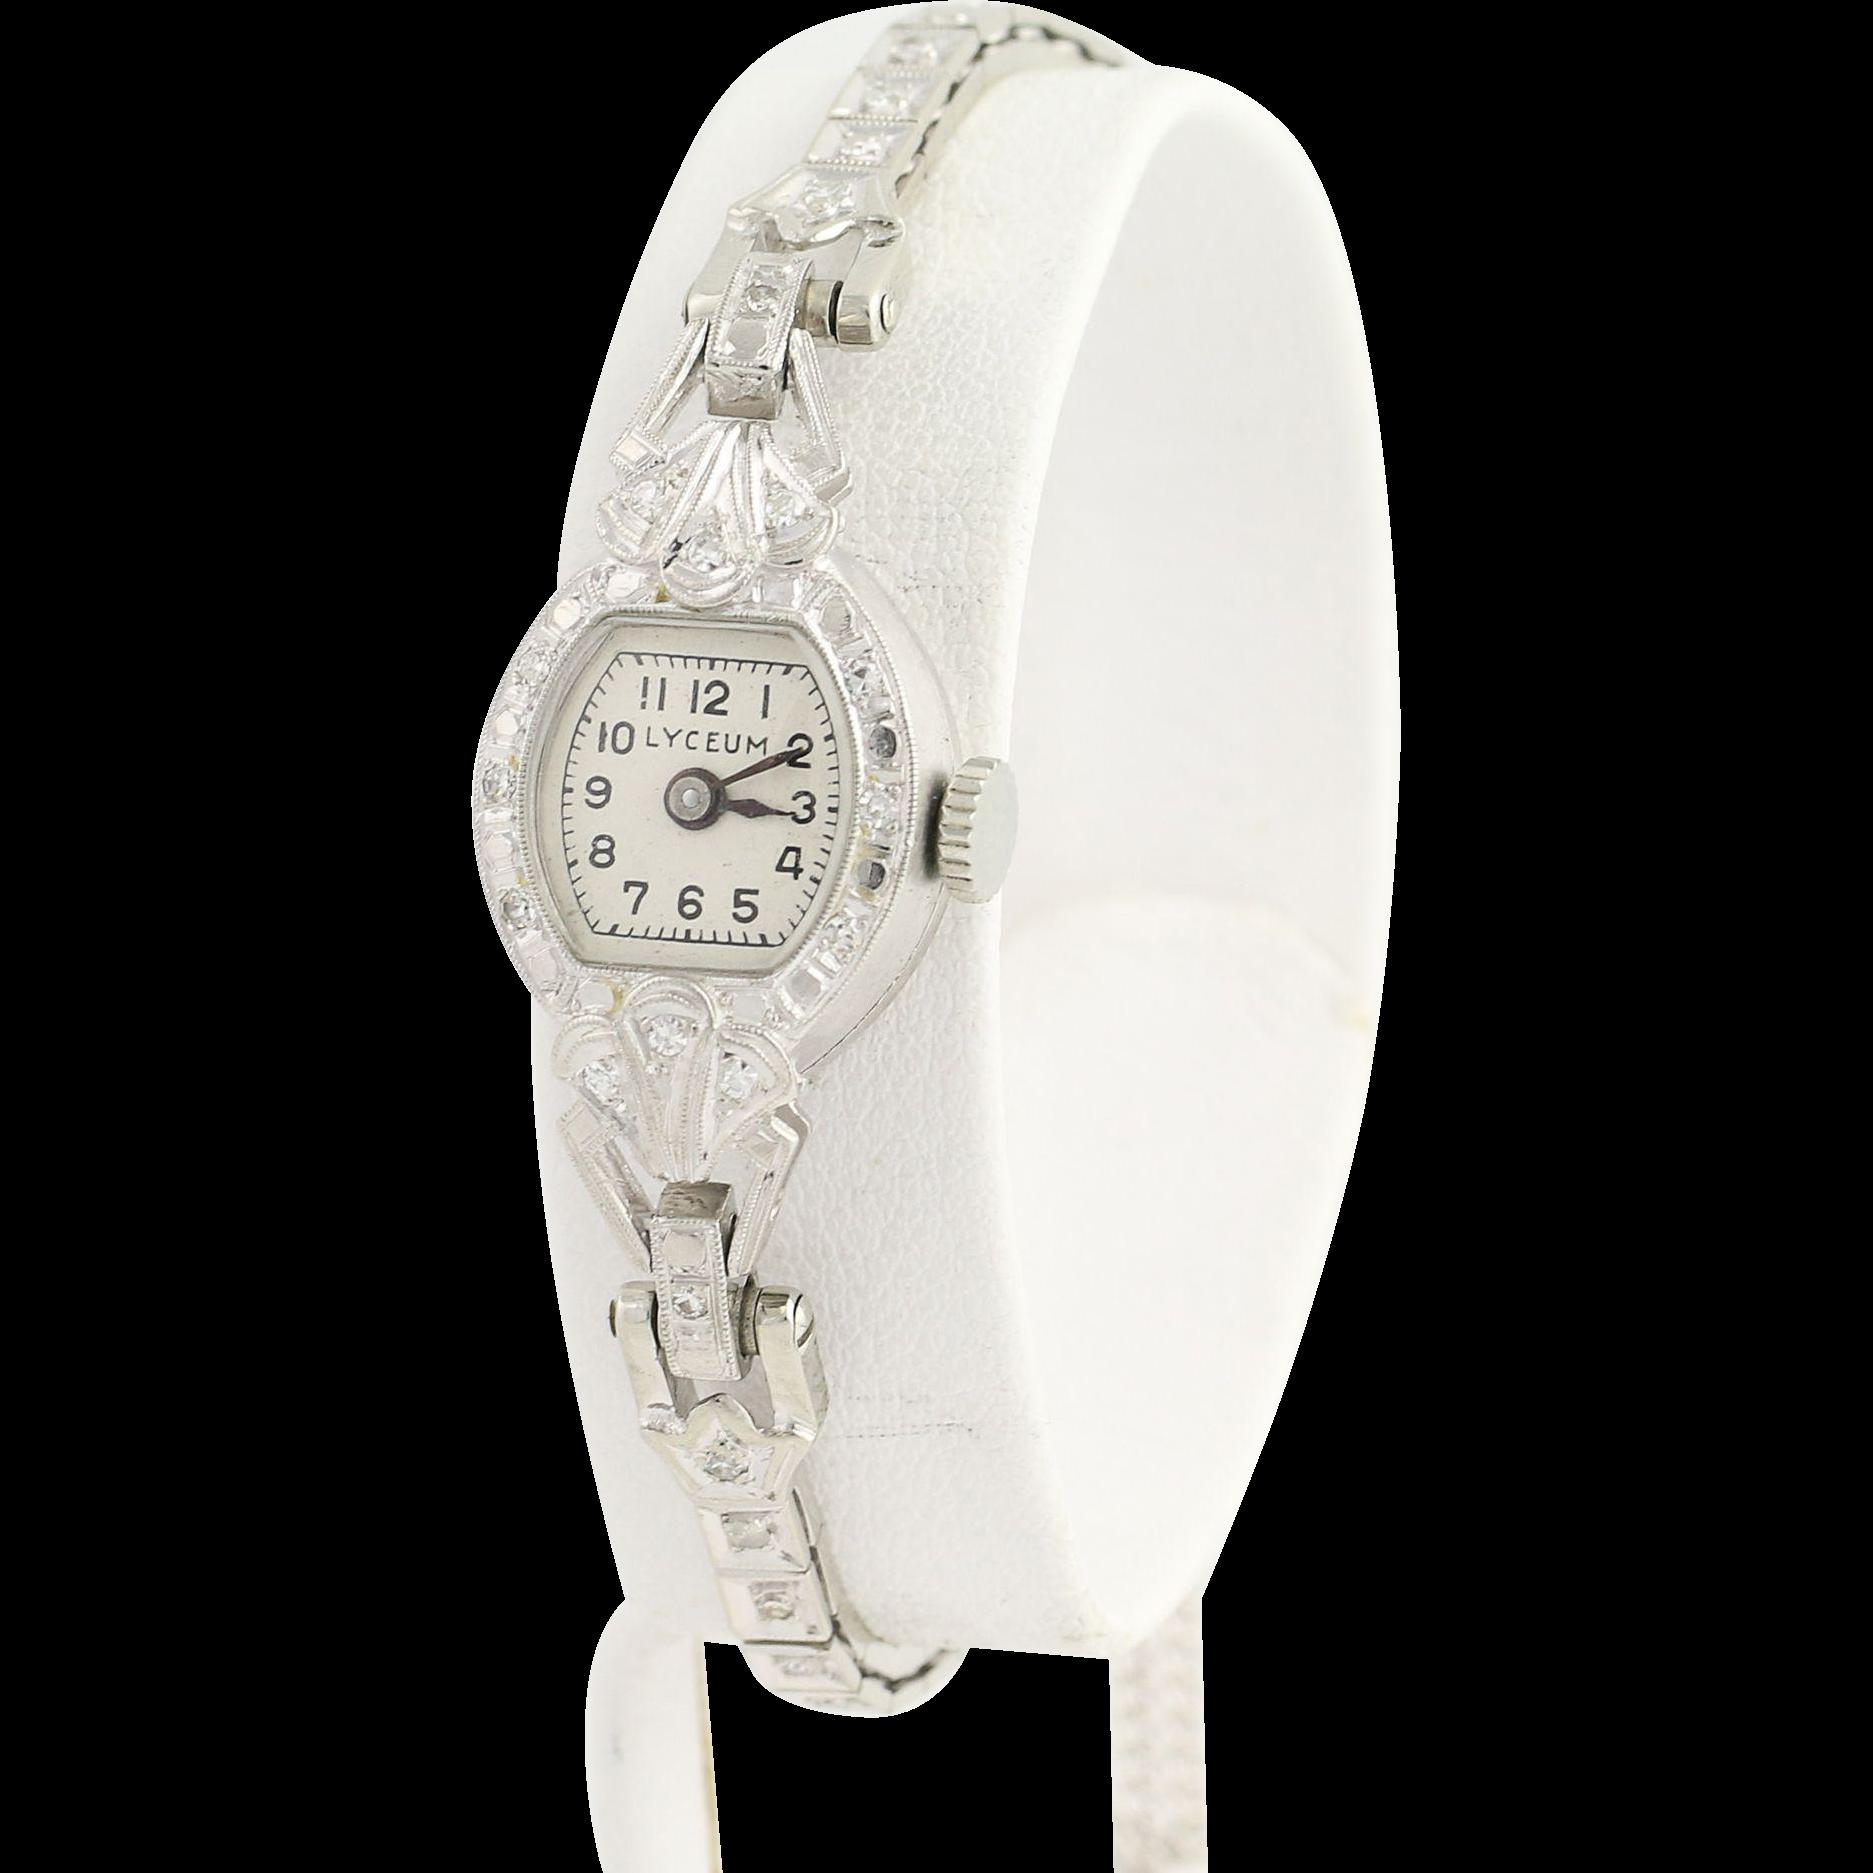 Vintage Lyceum Diamond Wristwatch - Platinum & 14k Gold 1950s Mechanical .30ctw